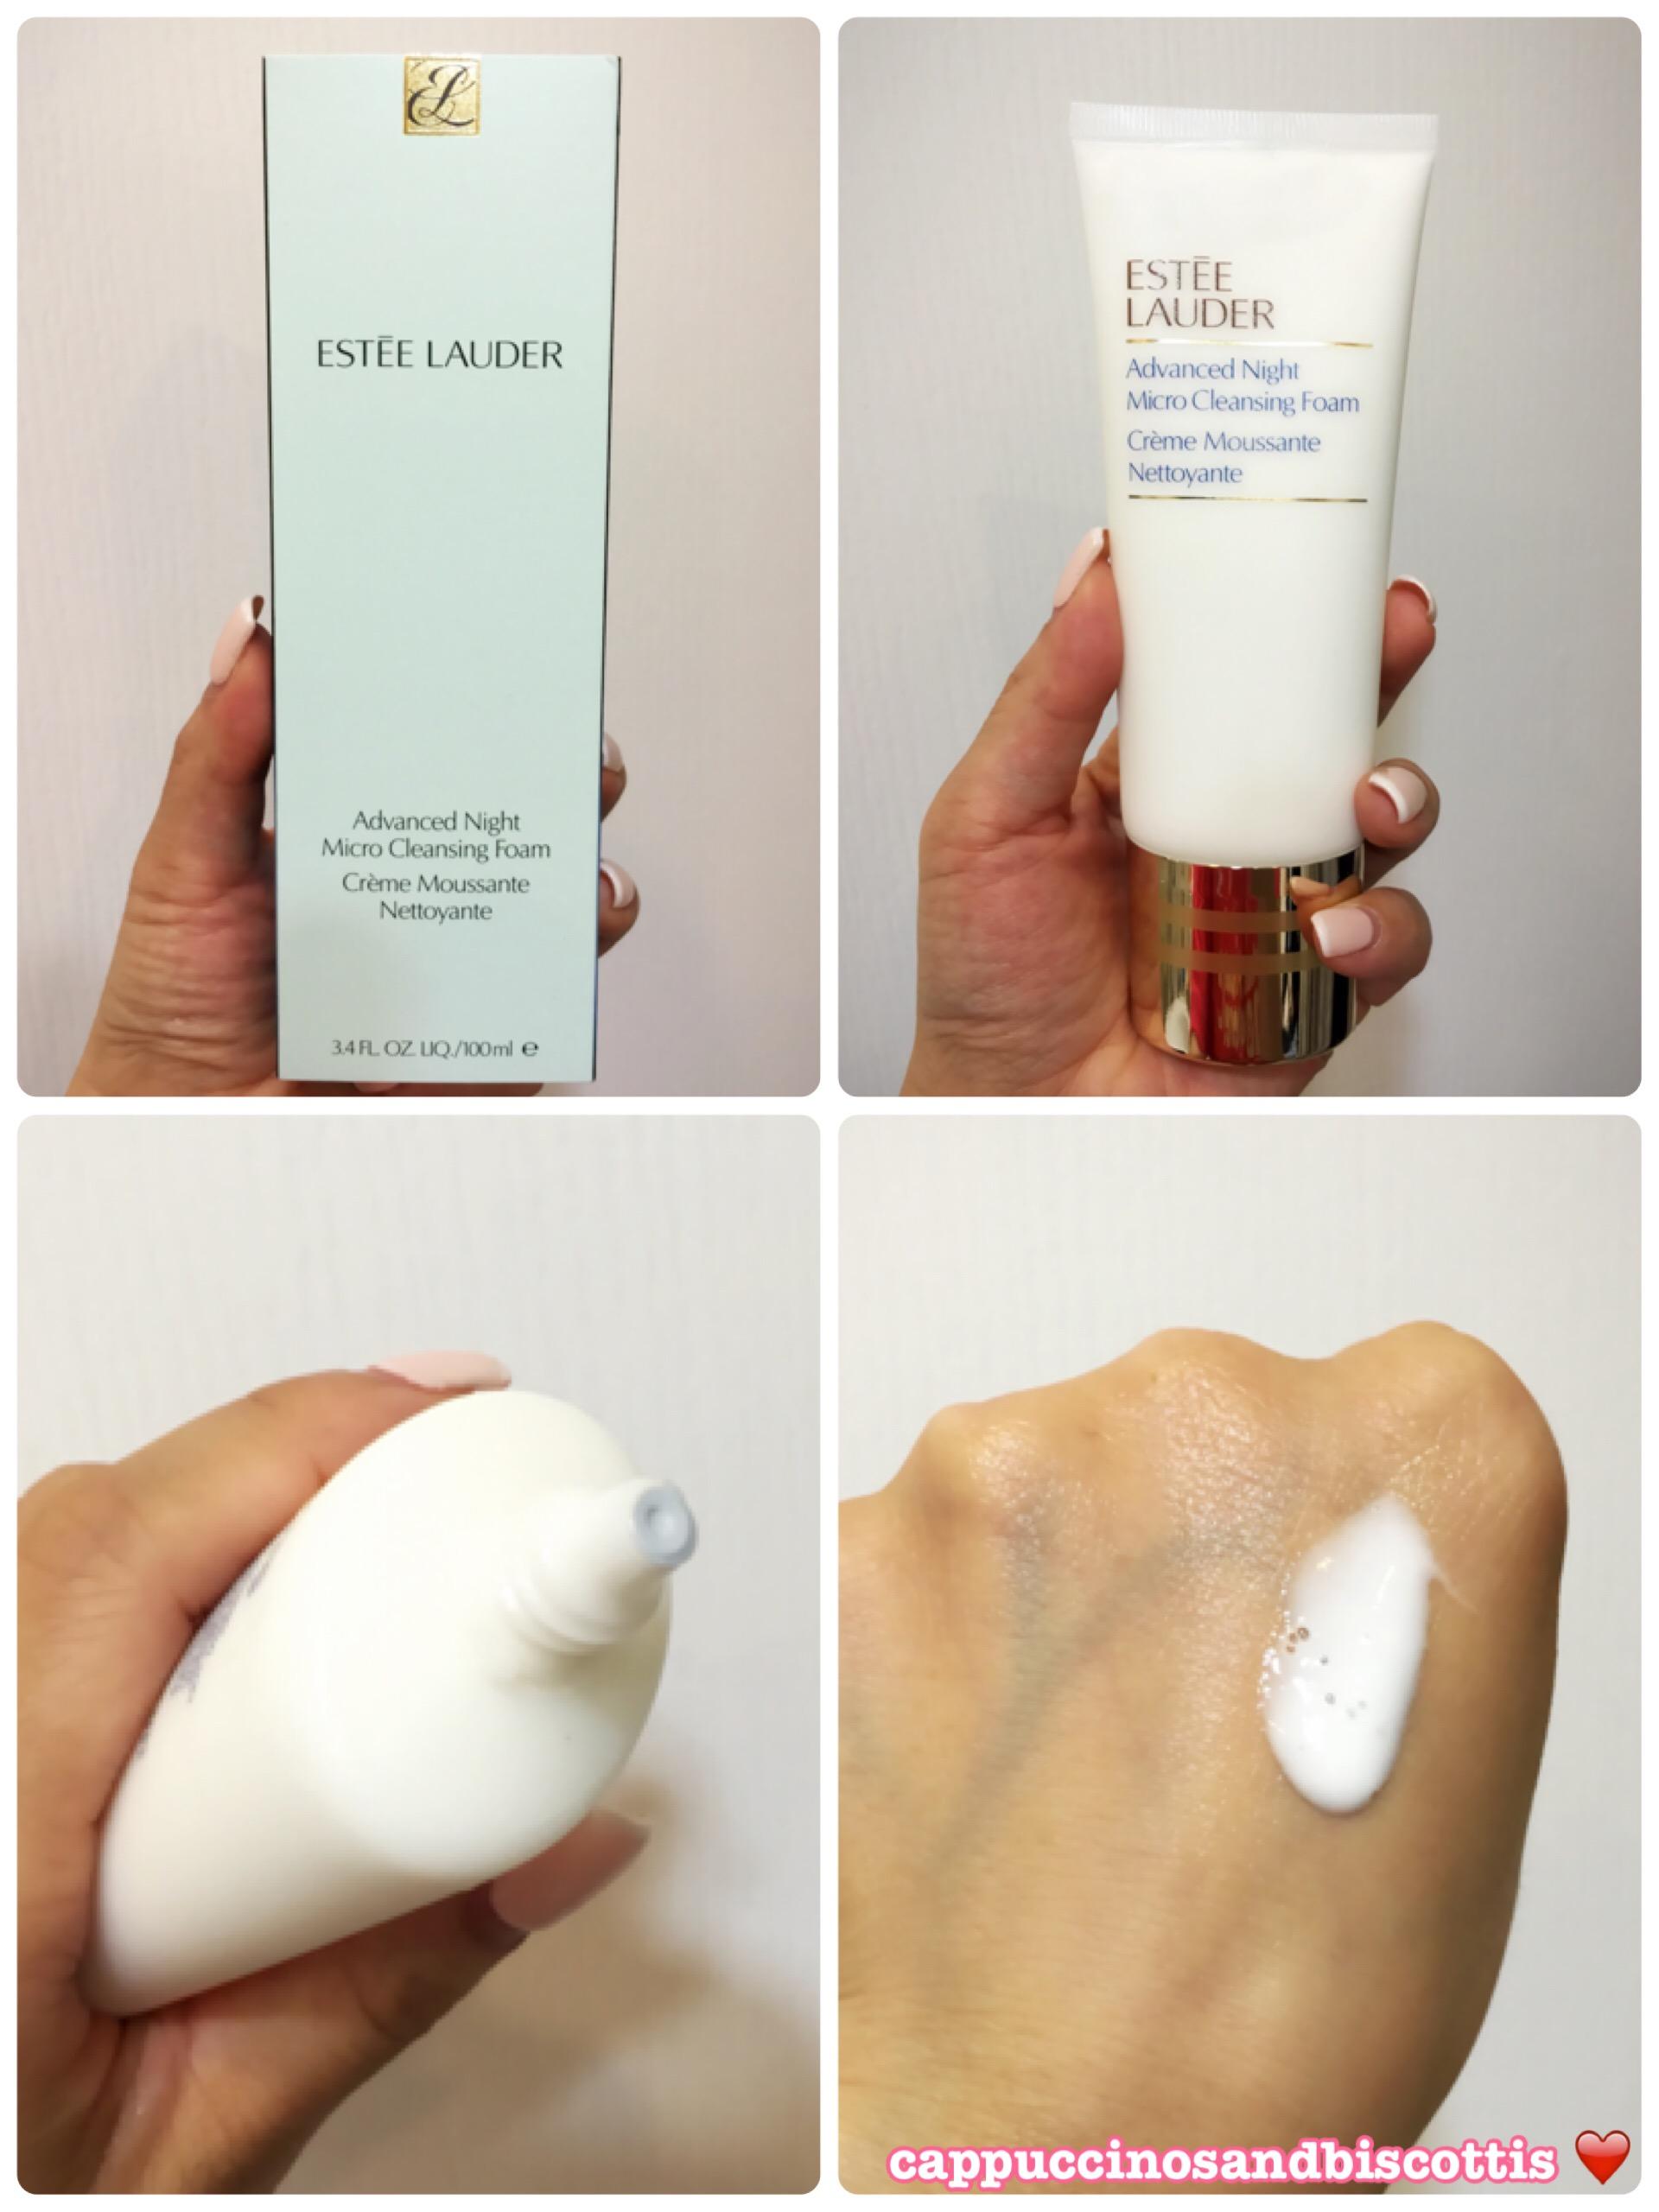 Advanced Night Micro Cleansing Foam by Estée Lauder #10